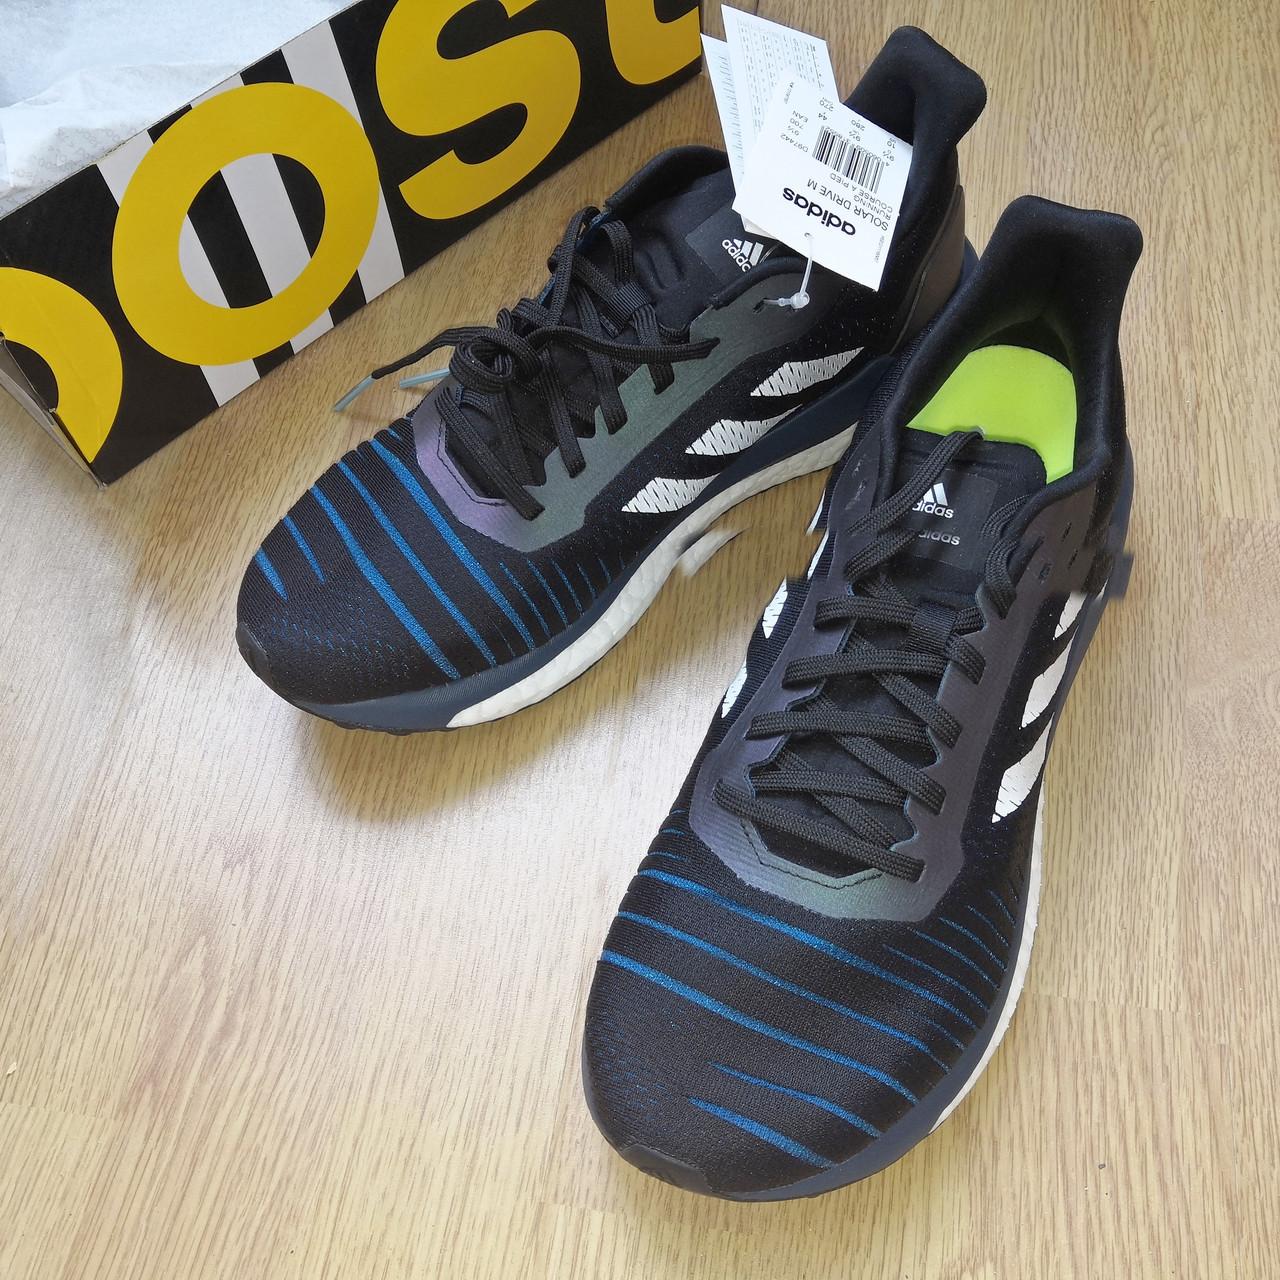 e05a1da2 Кроссовки мужские беговые Adidas Solar Drive Boost 9.5UK: продажа ...